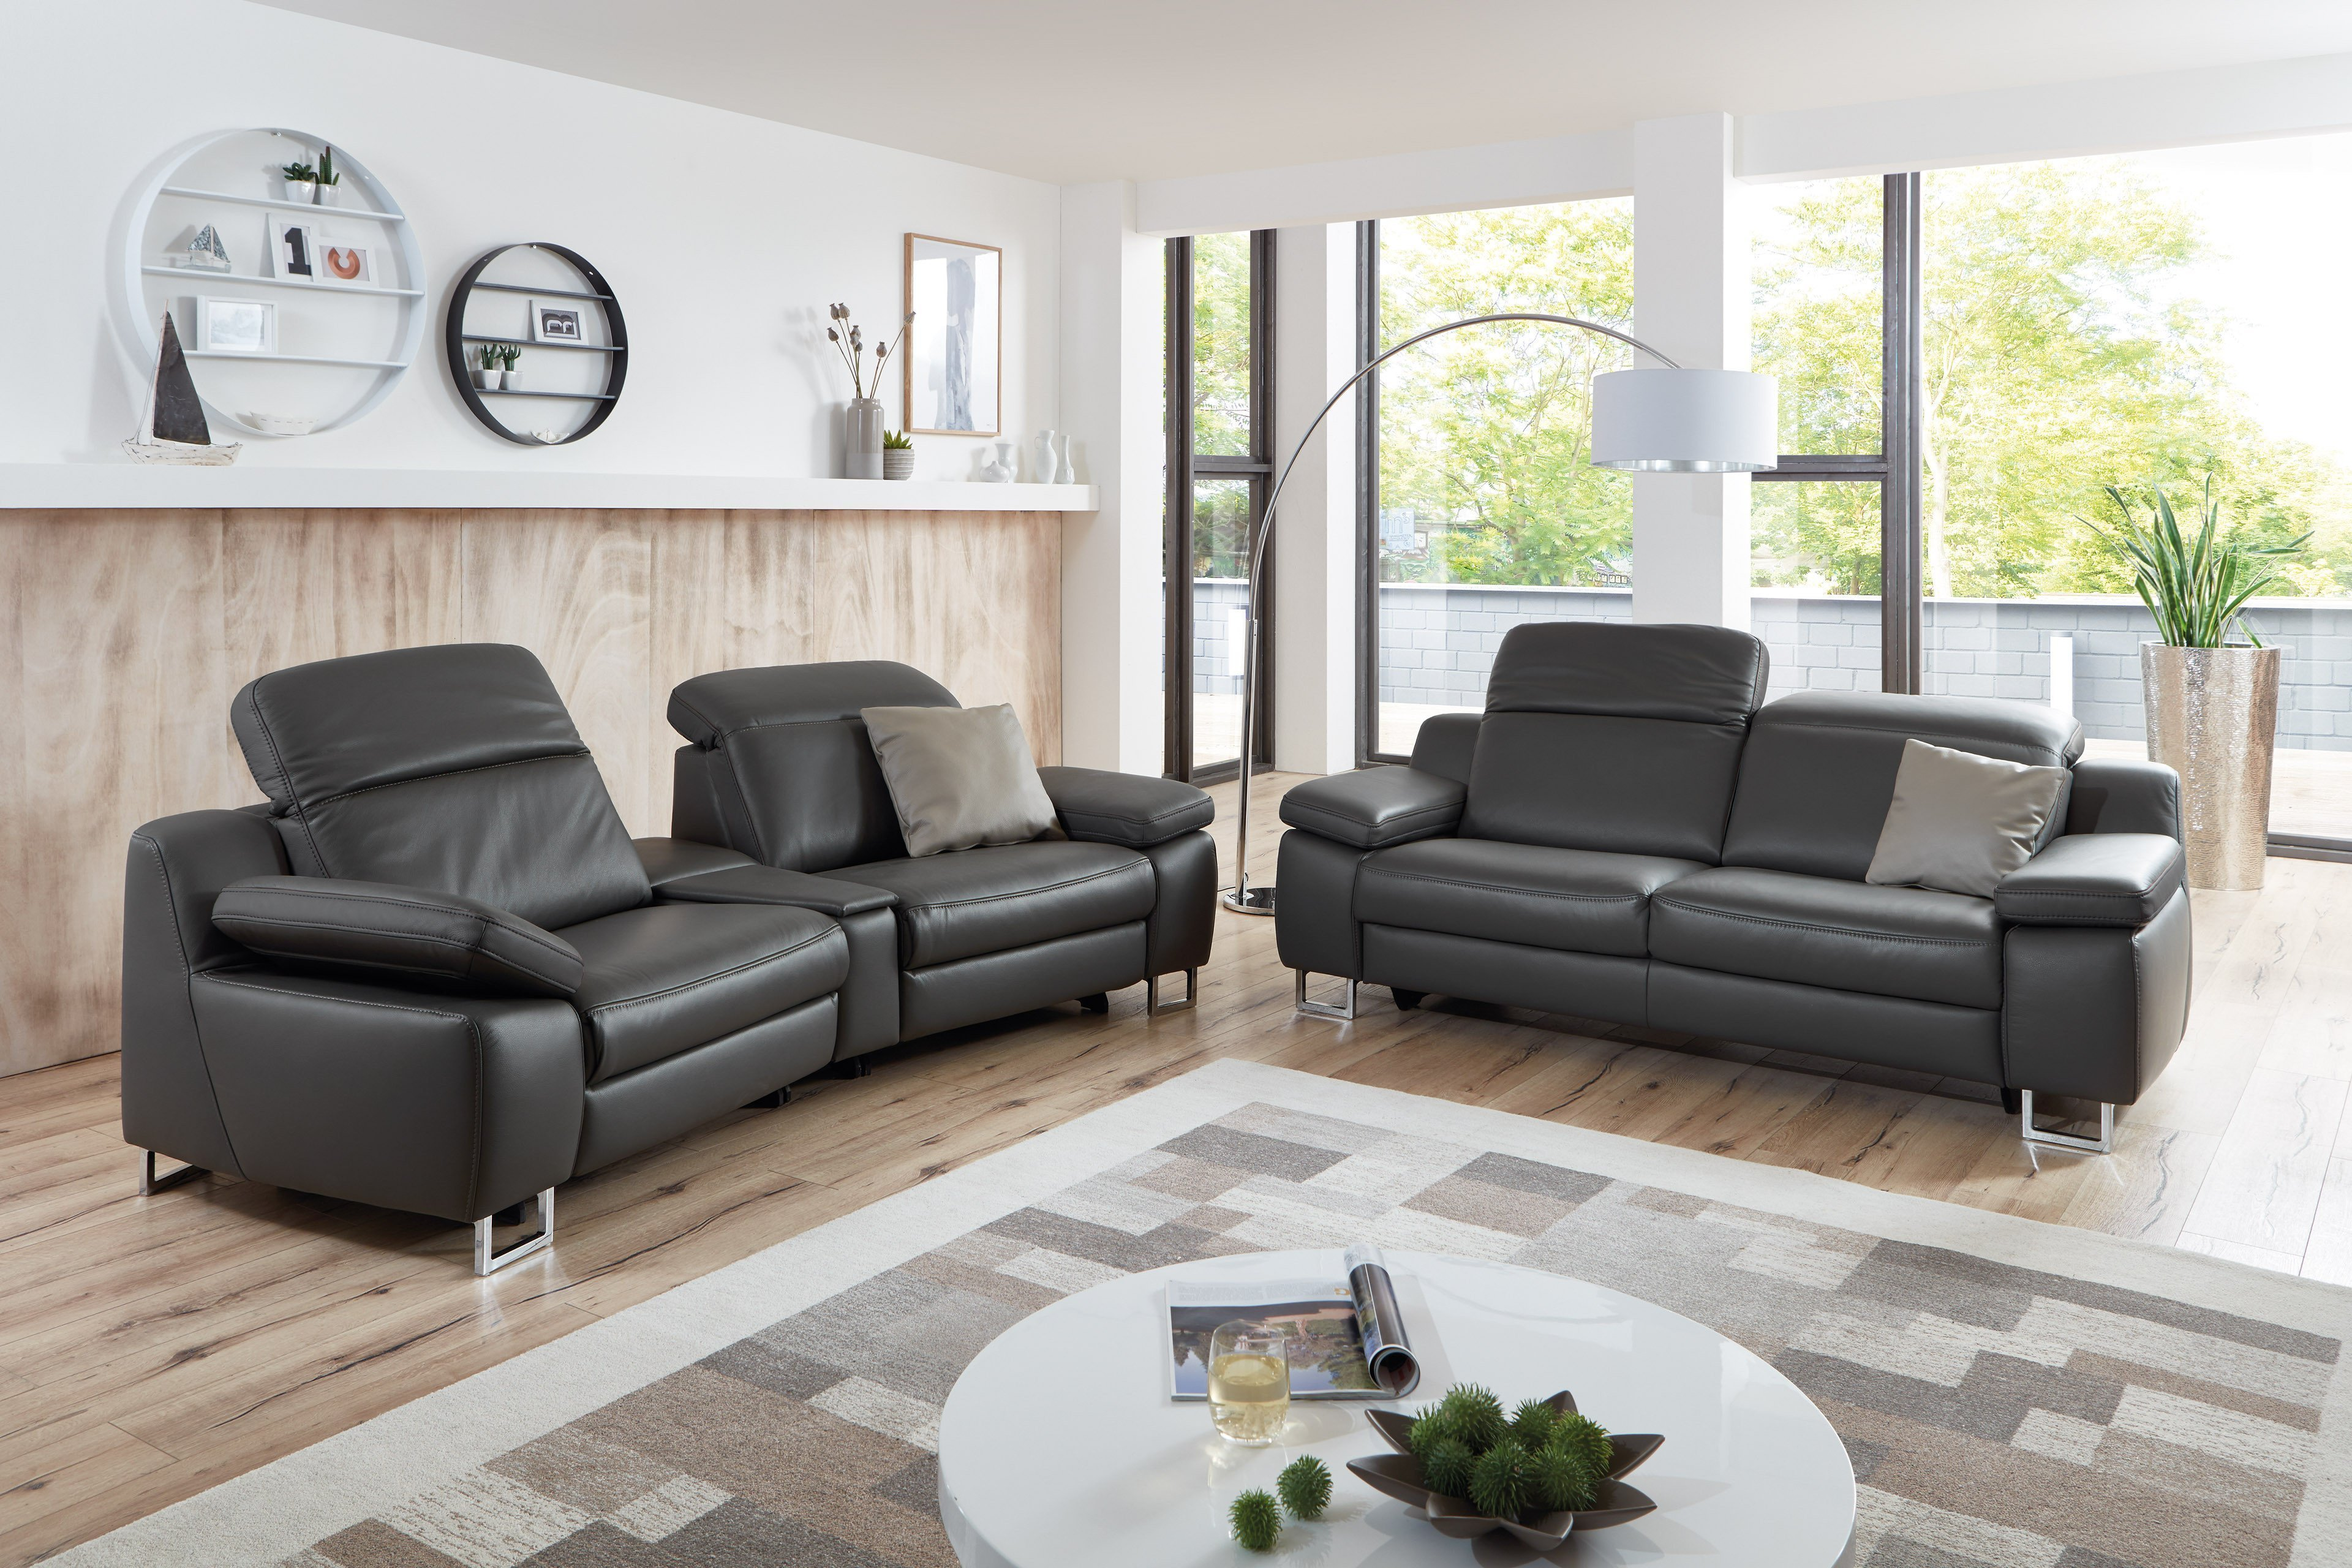 Hukla Rl1650 Ledergarnitur In Dunkelgrau Mobel Letz Ihr Online Shop